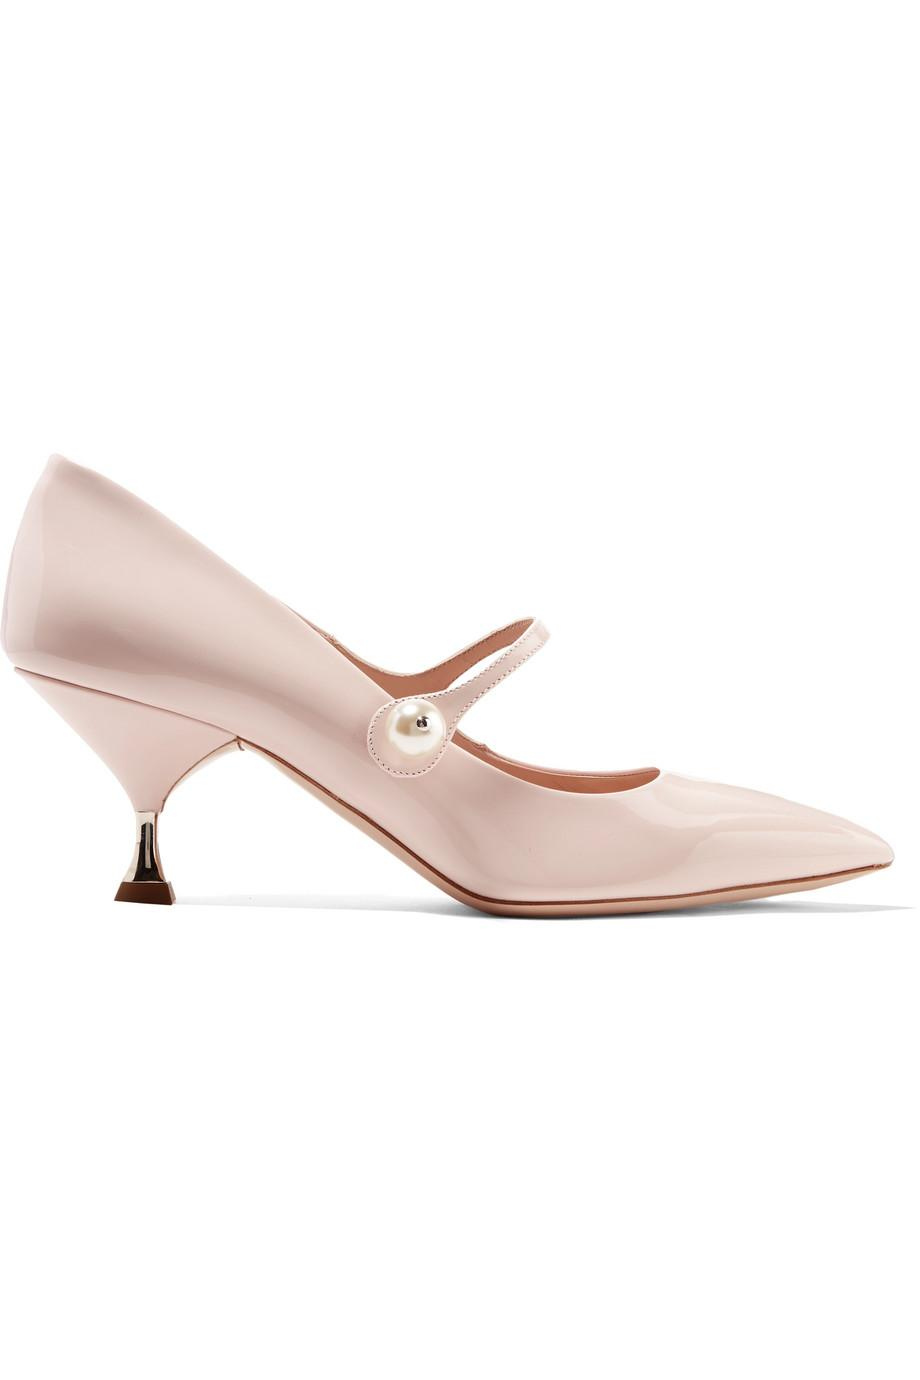 Faux Pearl-embellished Patent-leather Pumps - Pastel pink Miu Miu VlmAX